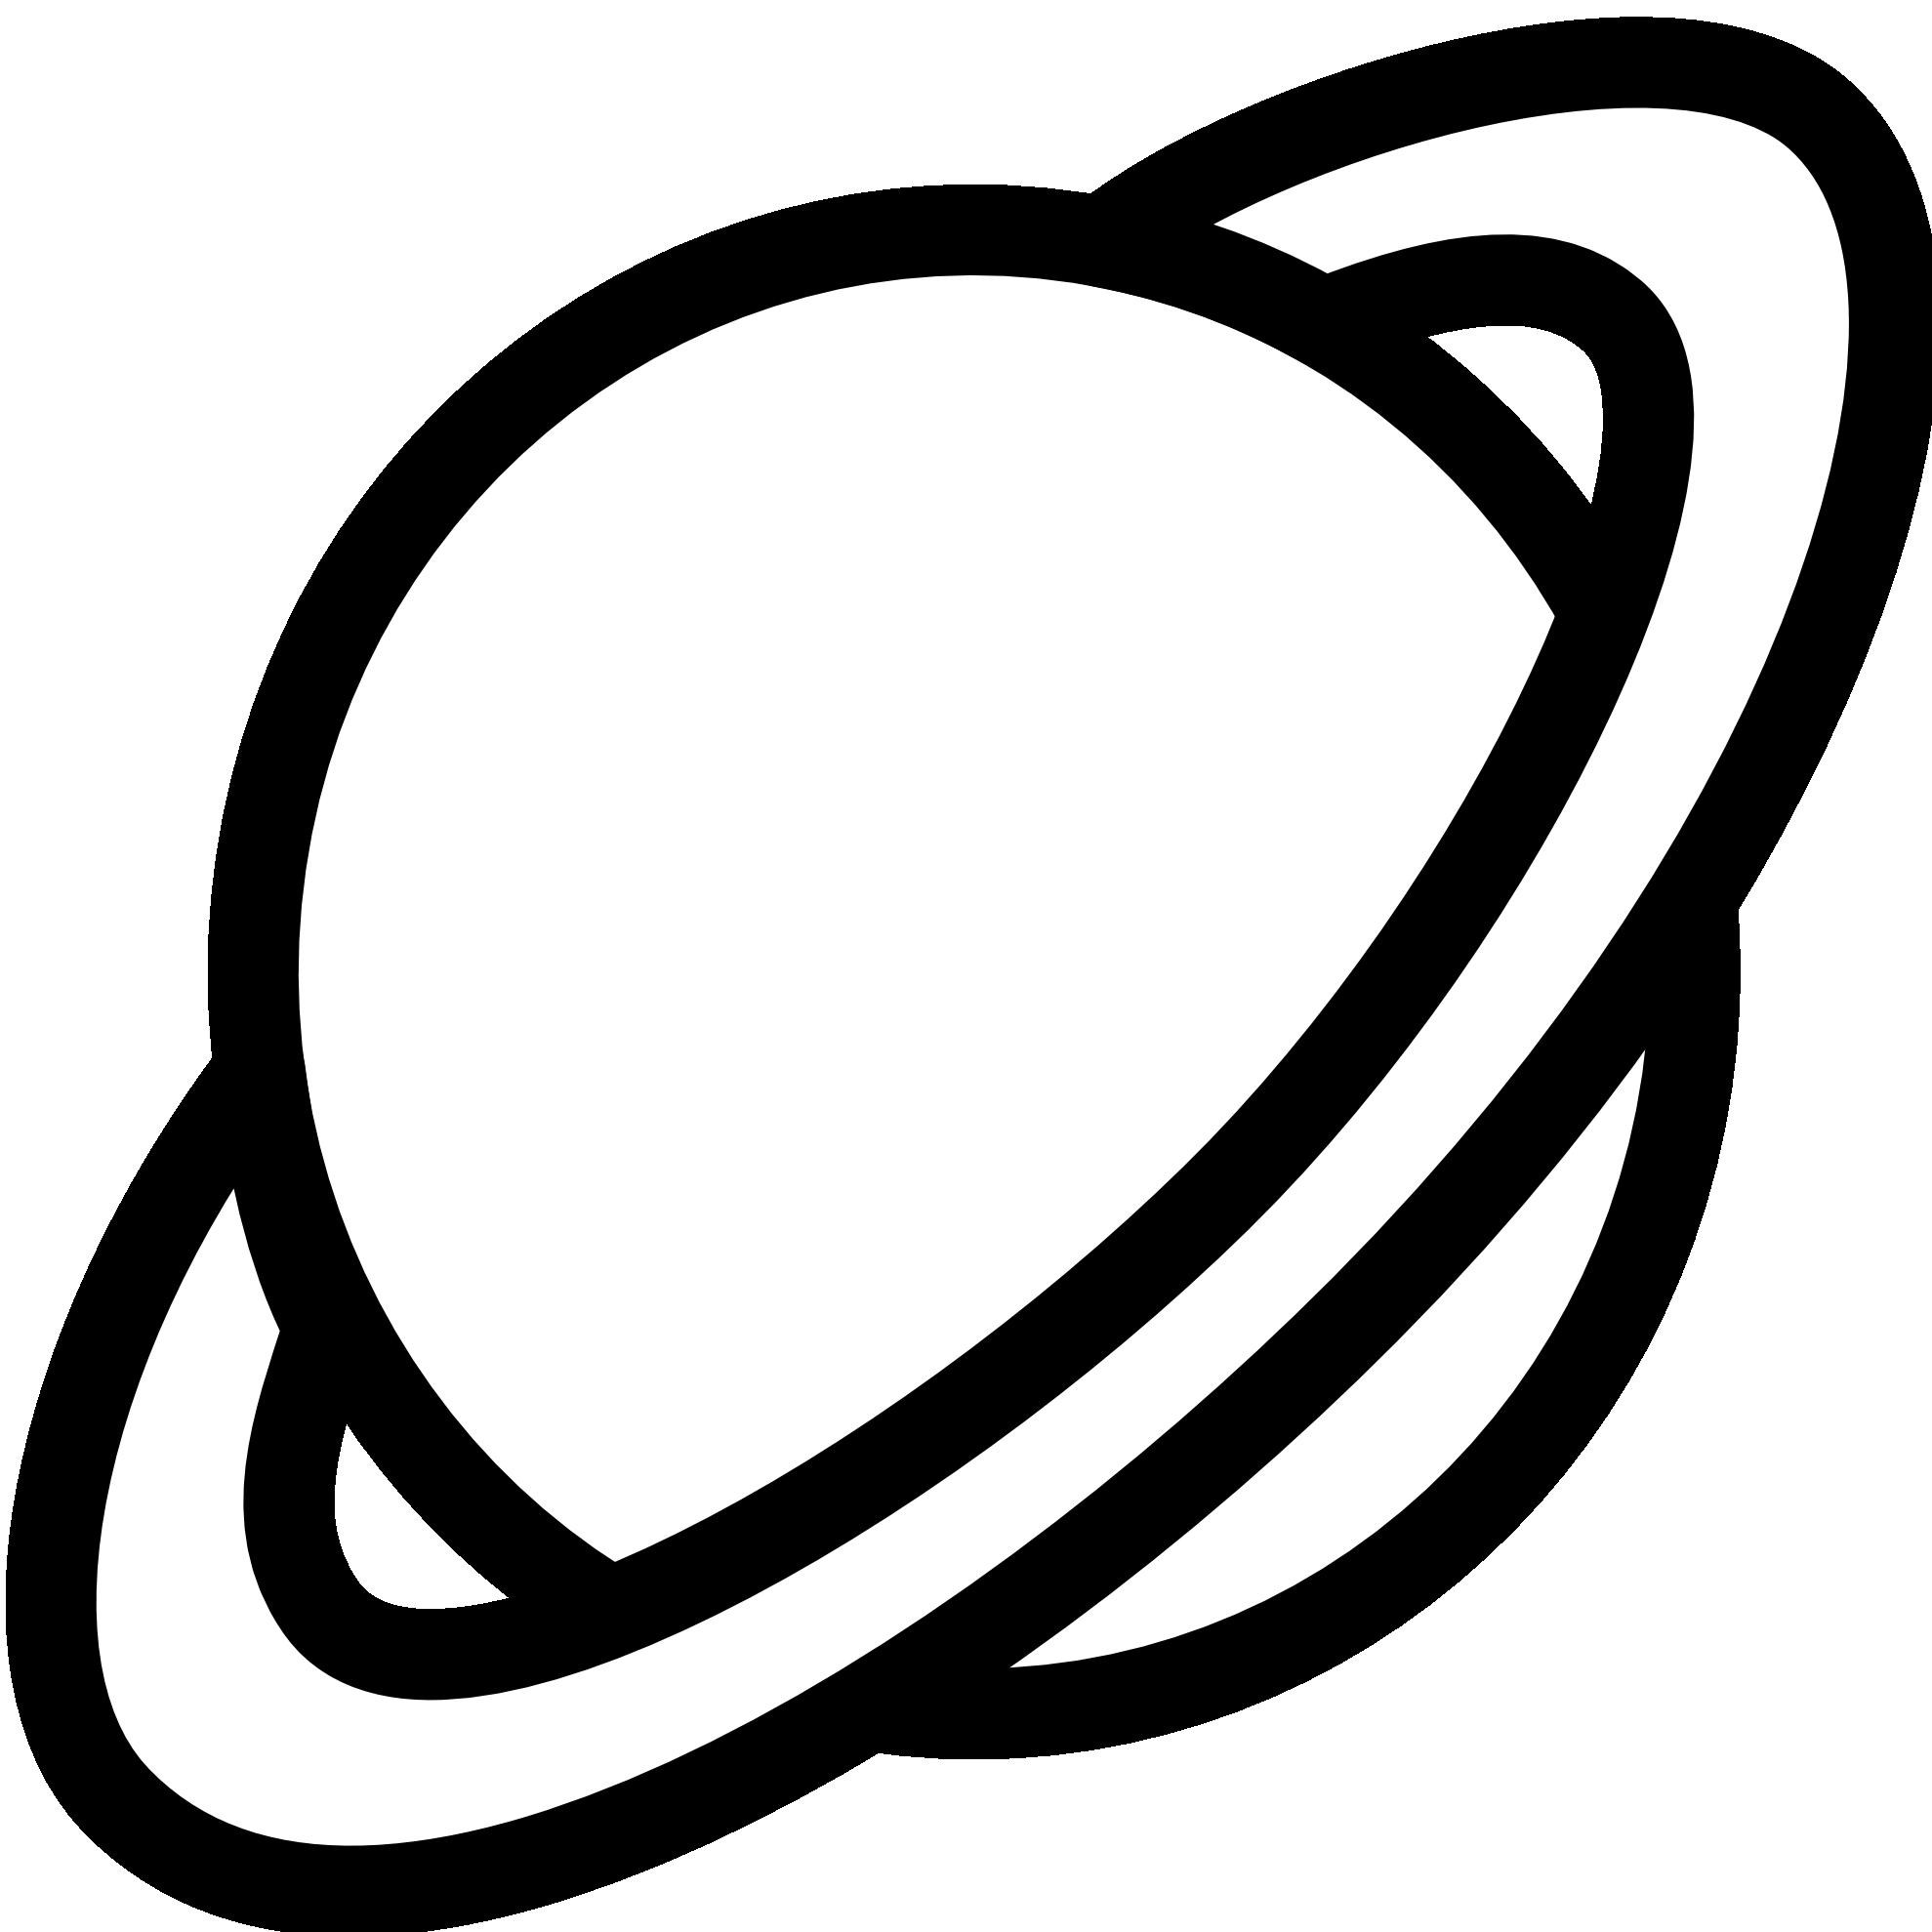 1979x1979 Planet Clip Art Free Clipart Images